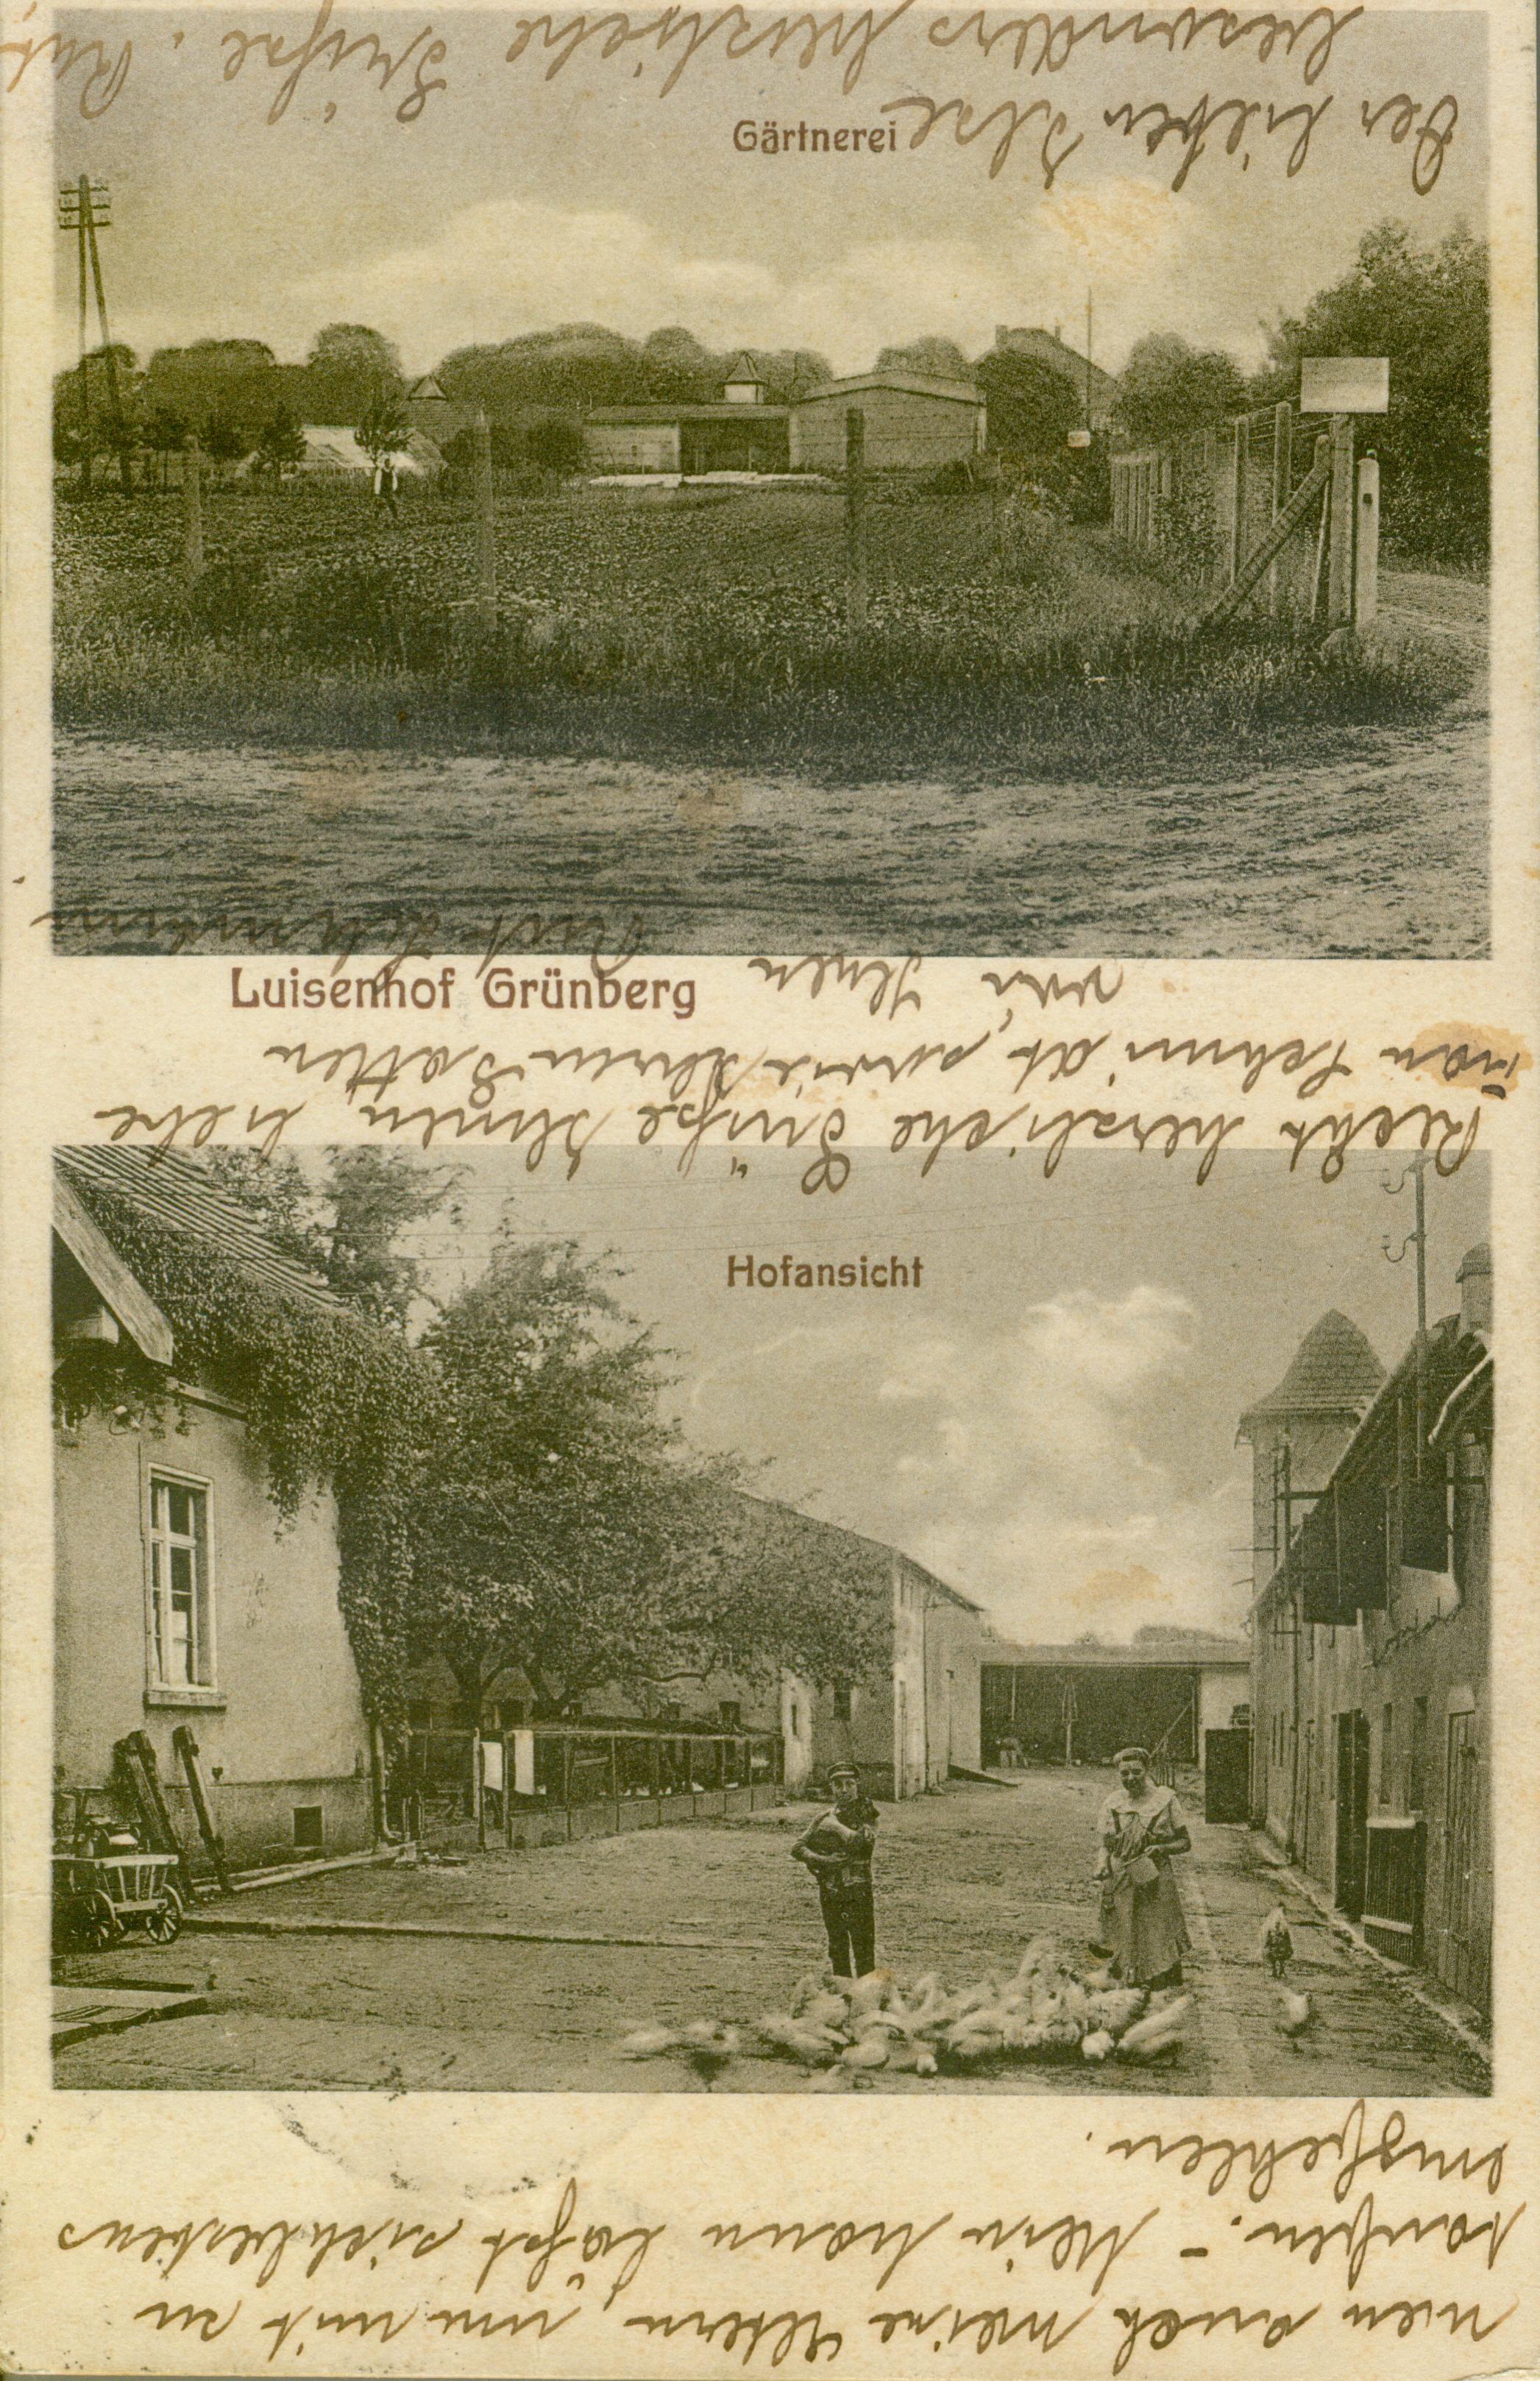 Luisenhof Zielona Góra, lubuskie